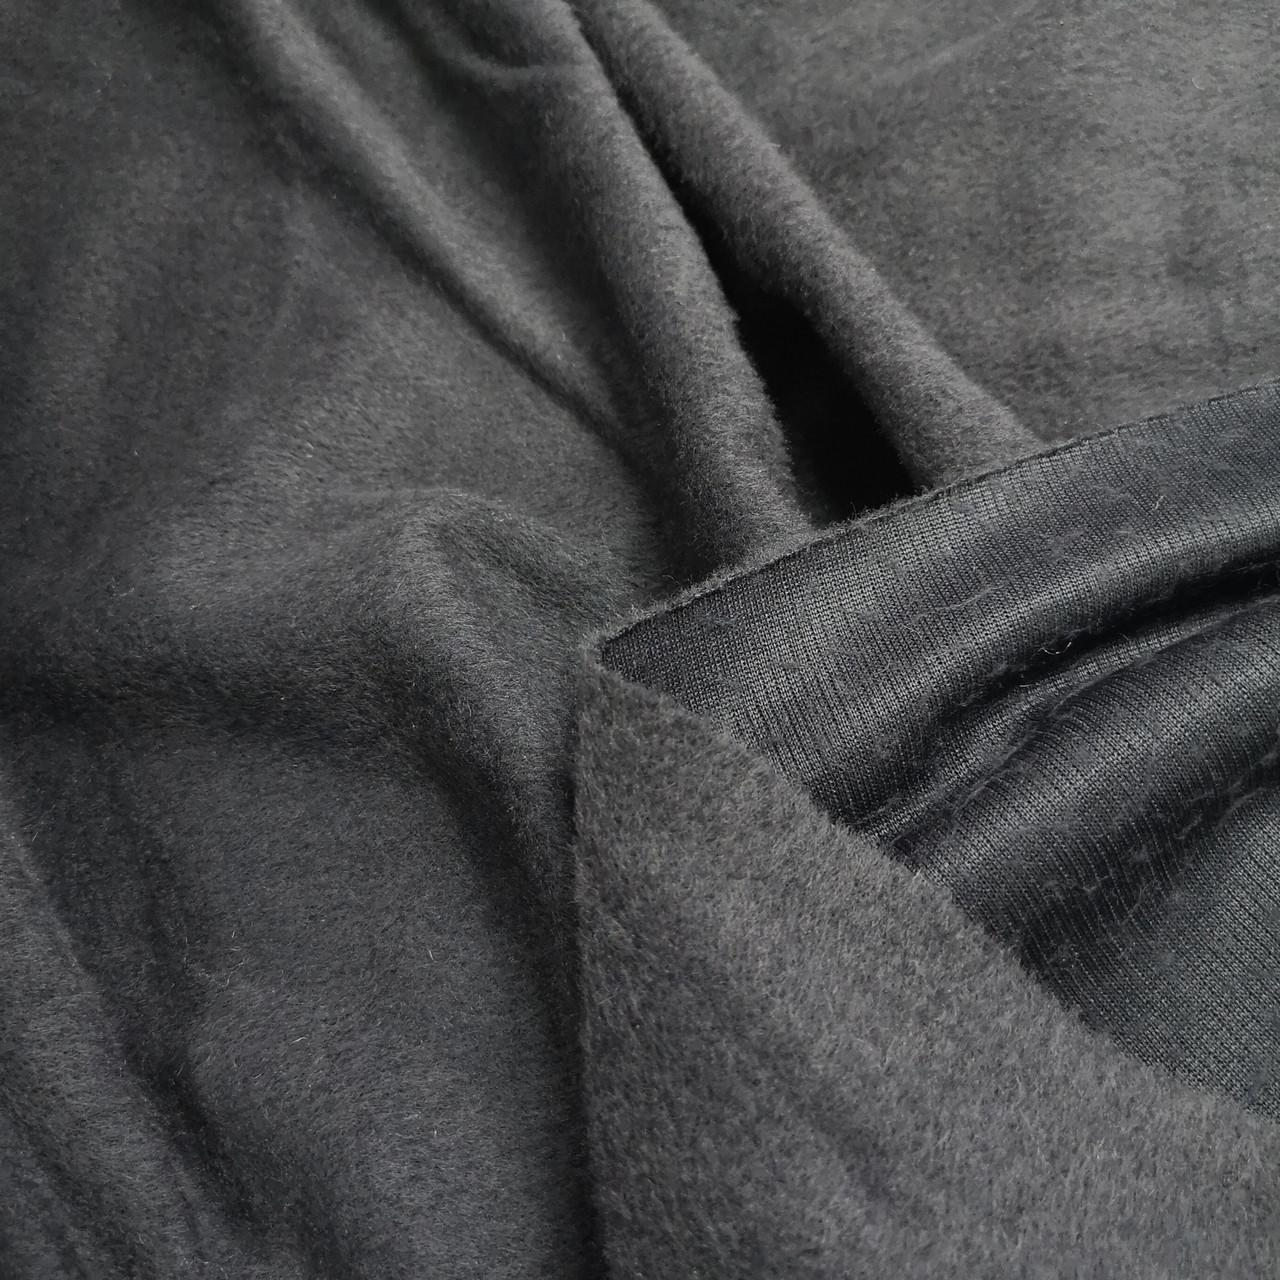 Пальтовая ткань ворсовая серая РАСПРОДАЖА